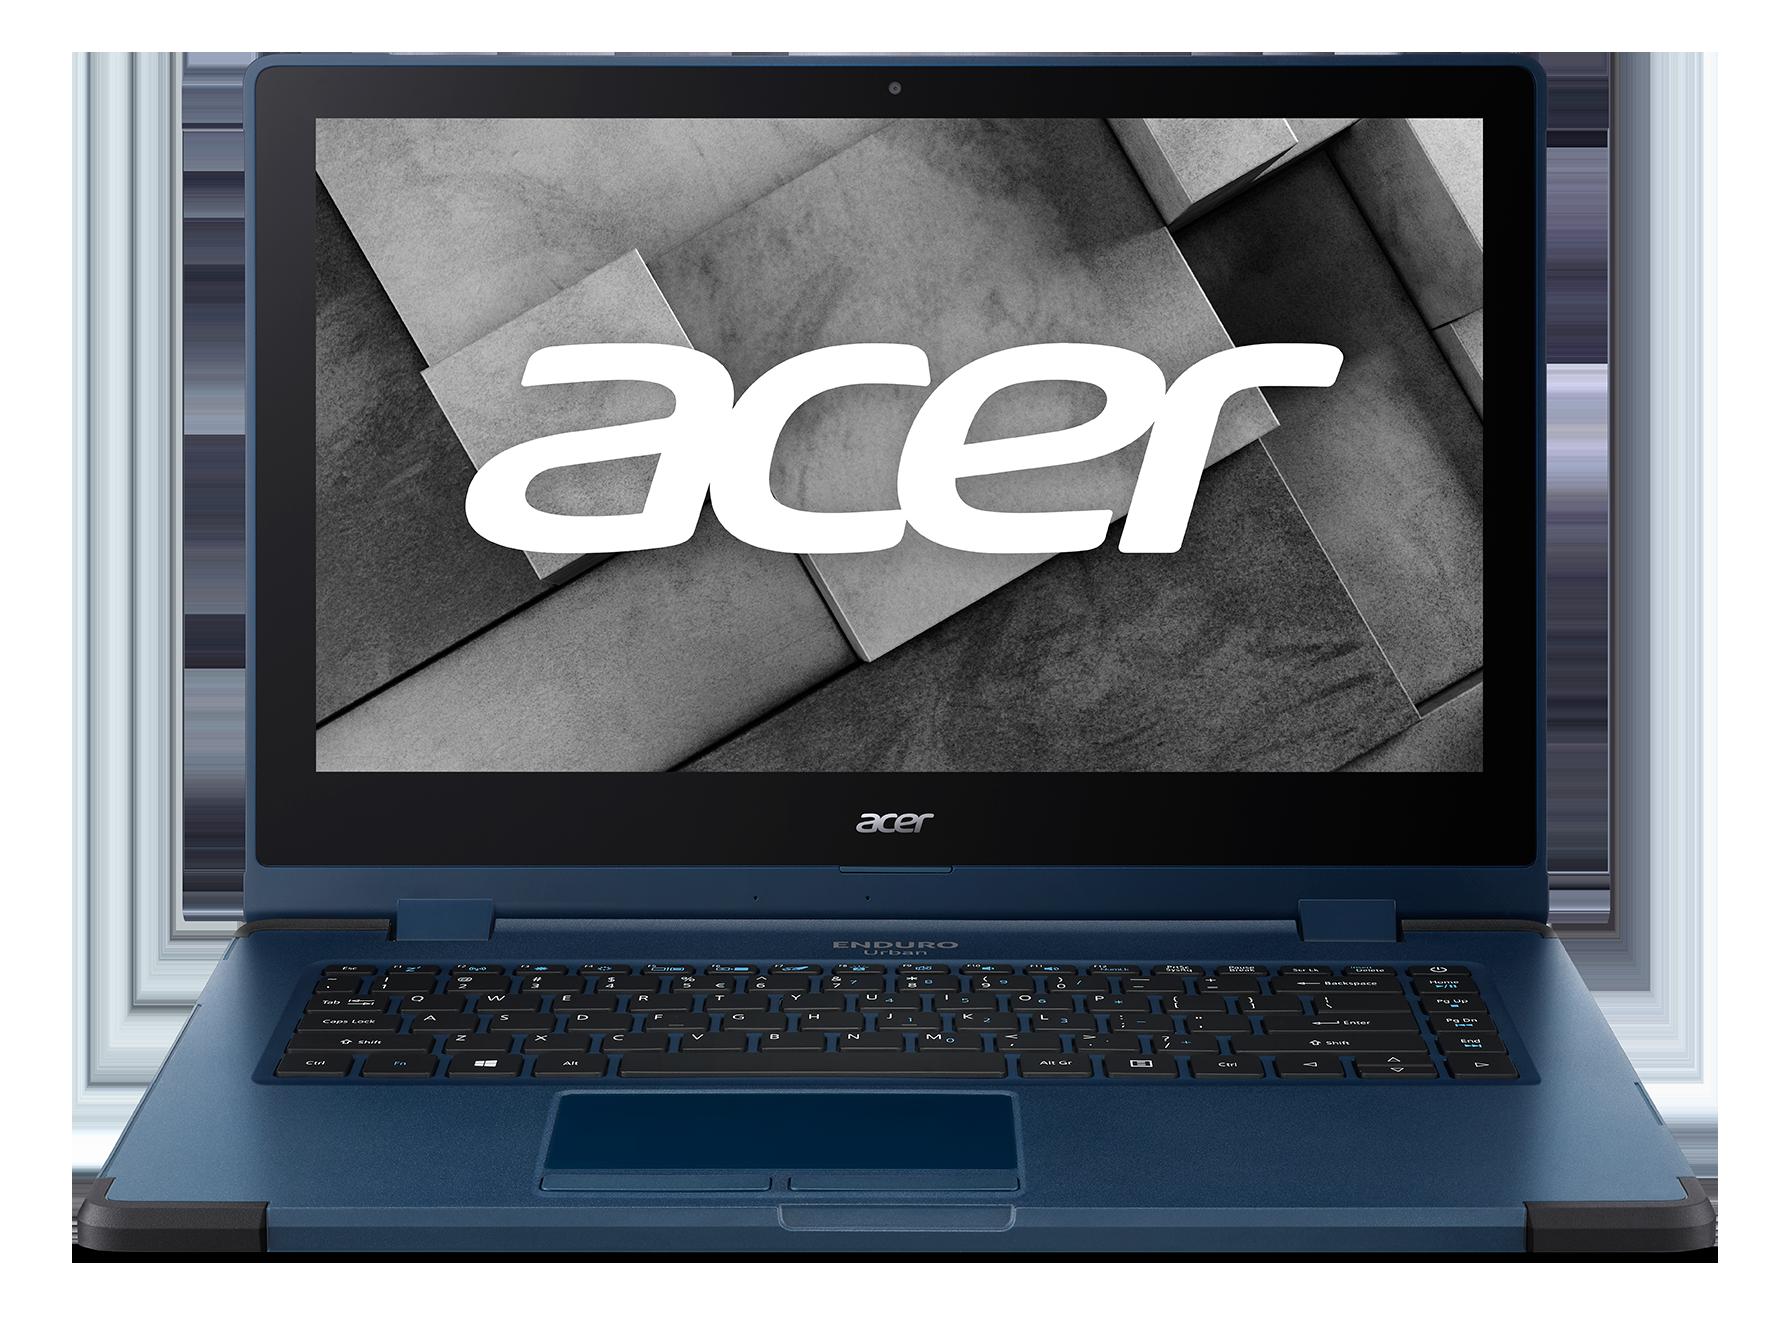 Acer Enduro Urban N3 - 14''/i3-1115G4/512SSD/8G/IP53/W10 - NR.R18EC.004